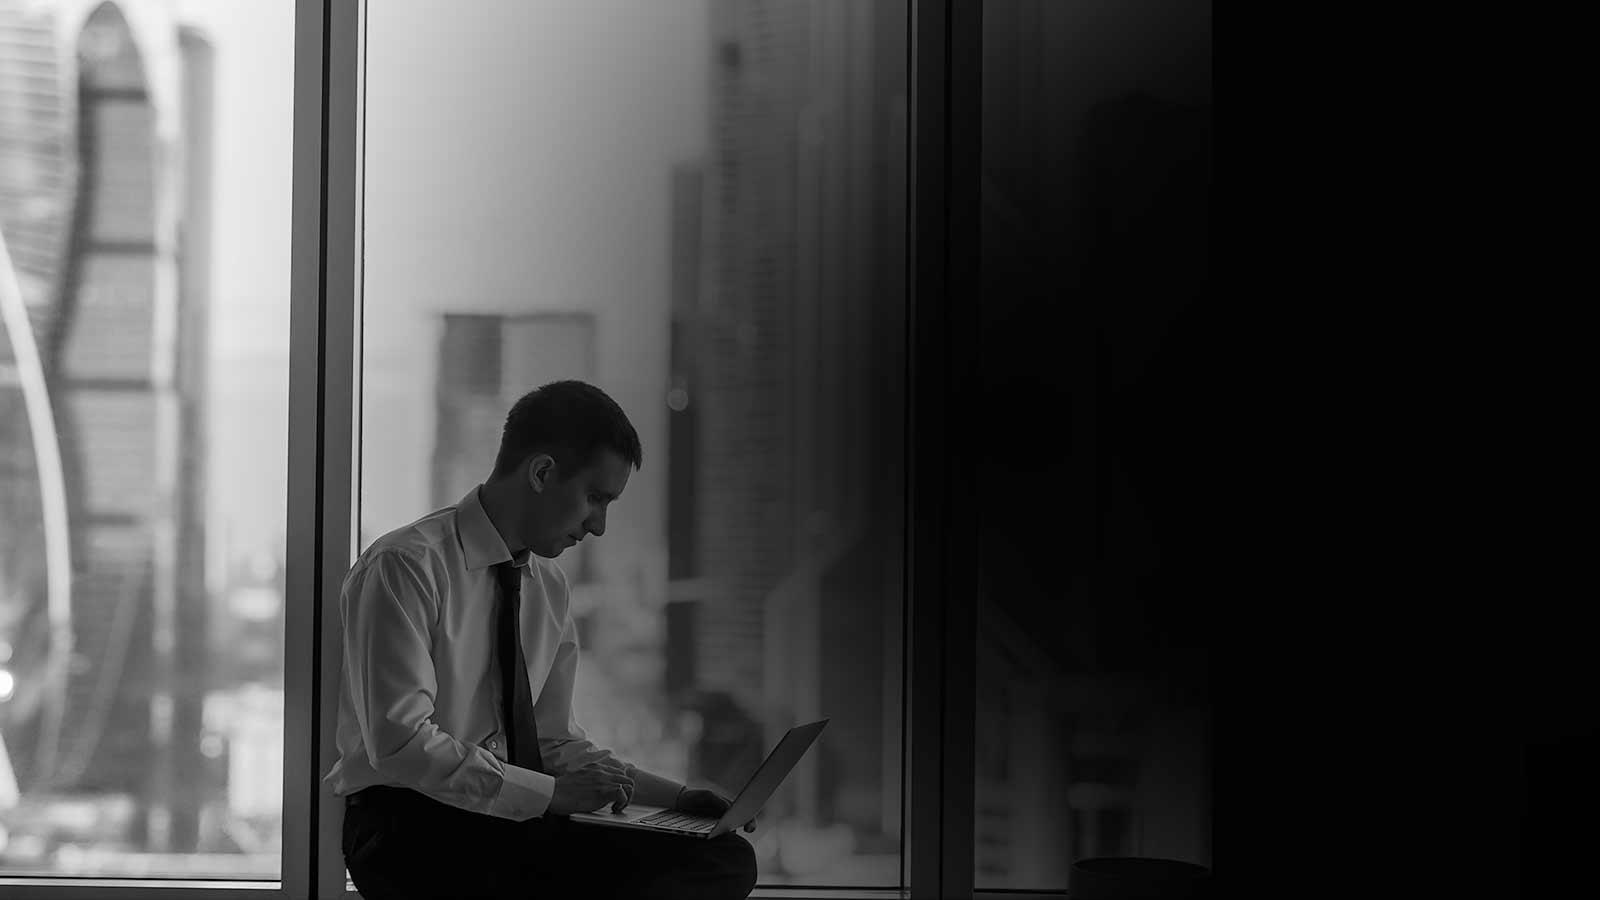 financials-financiele-bedrijven-financiele-dienstverleners-consult-consultant-consultants-advies-adviseur-adviseurs-it-ict-proces